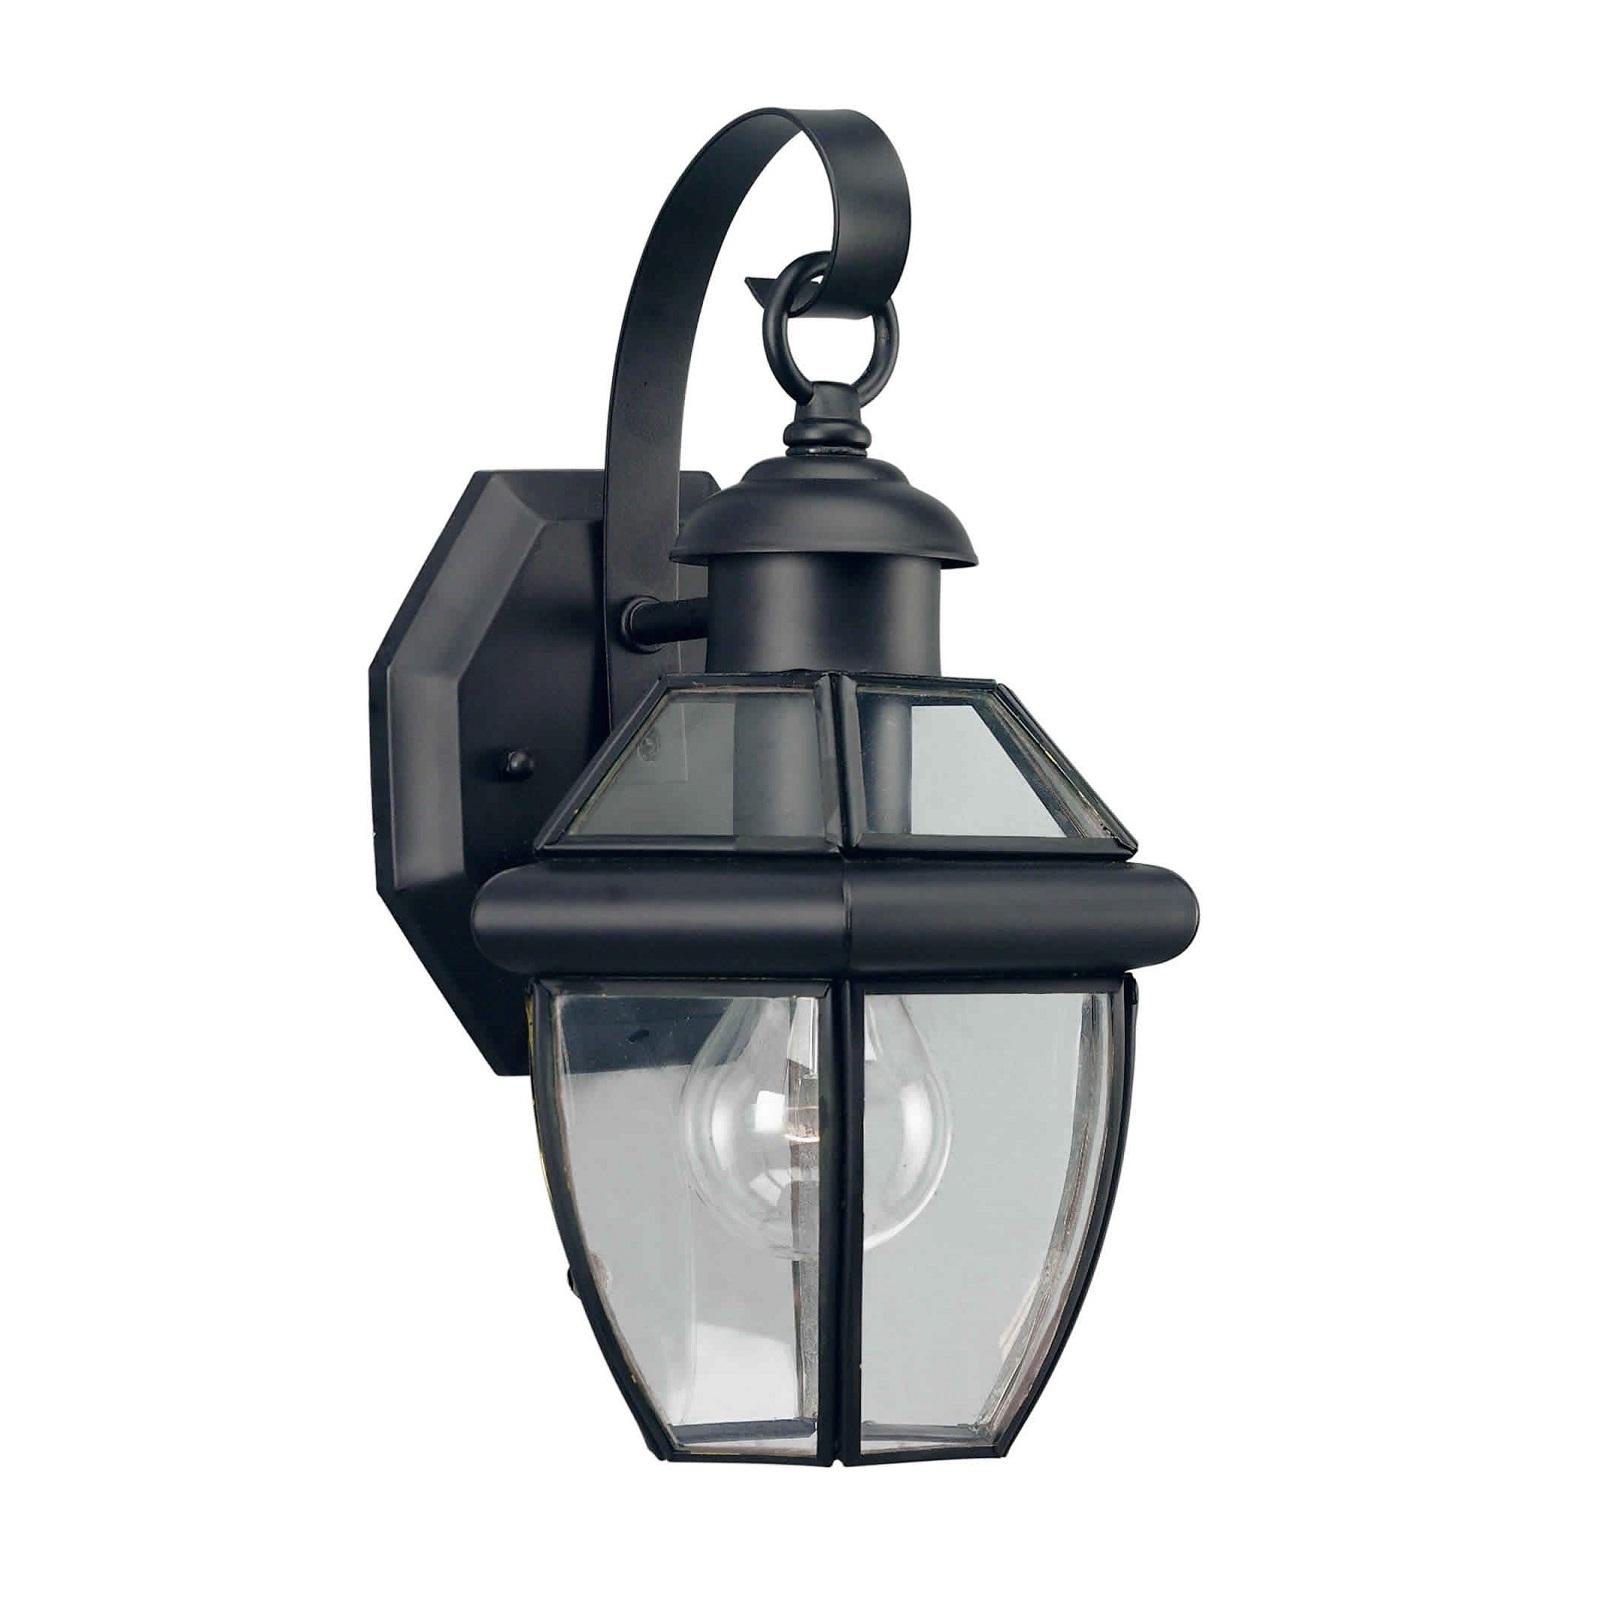 Black Lantern Wall Lights : Forte Lighting 1 Light Outdoor Wall Lantern In Black l Brilliant Source Lighting